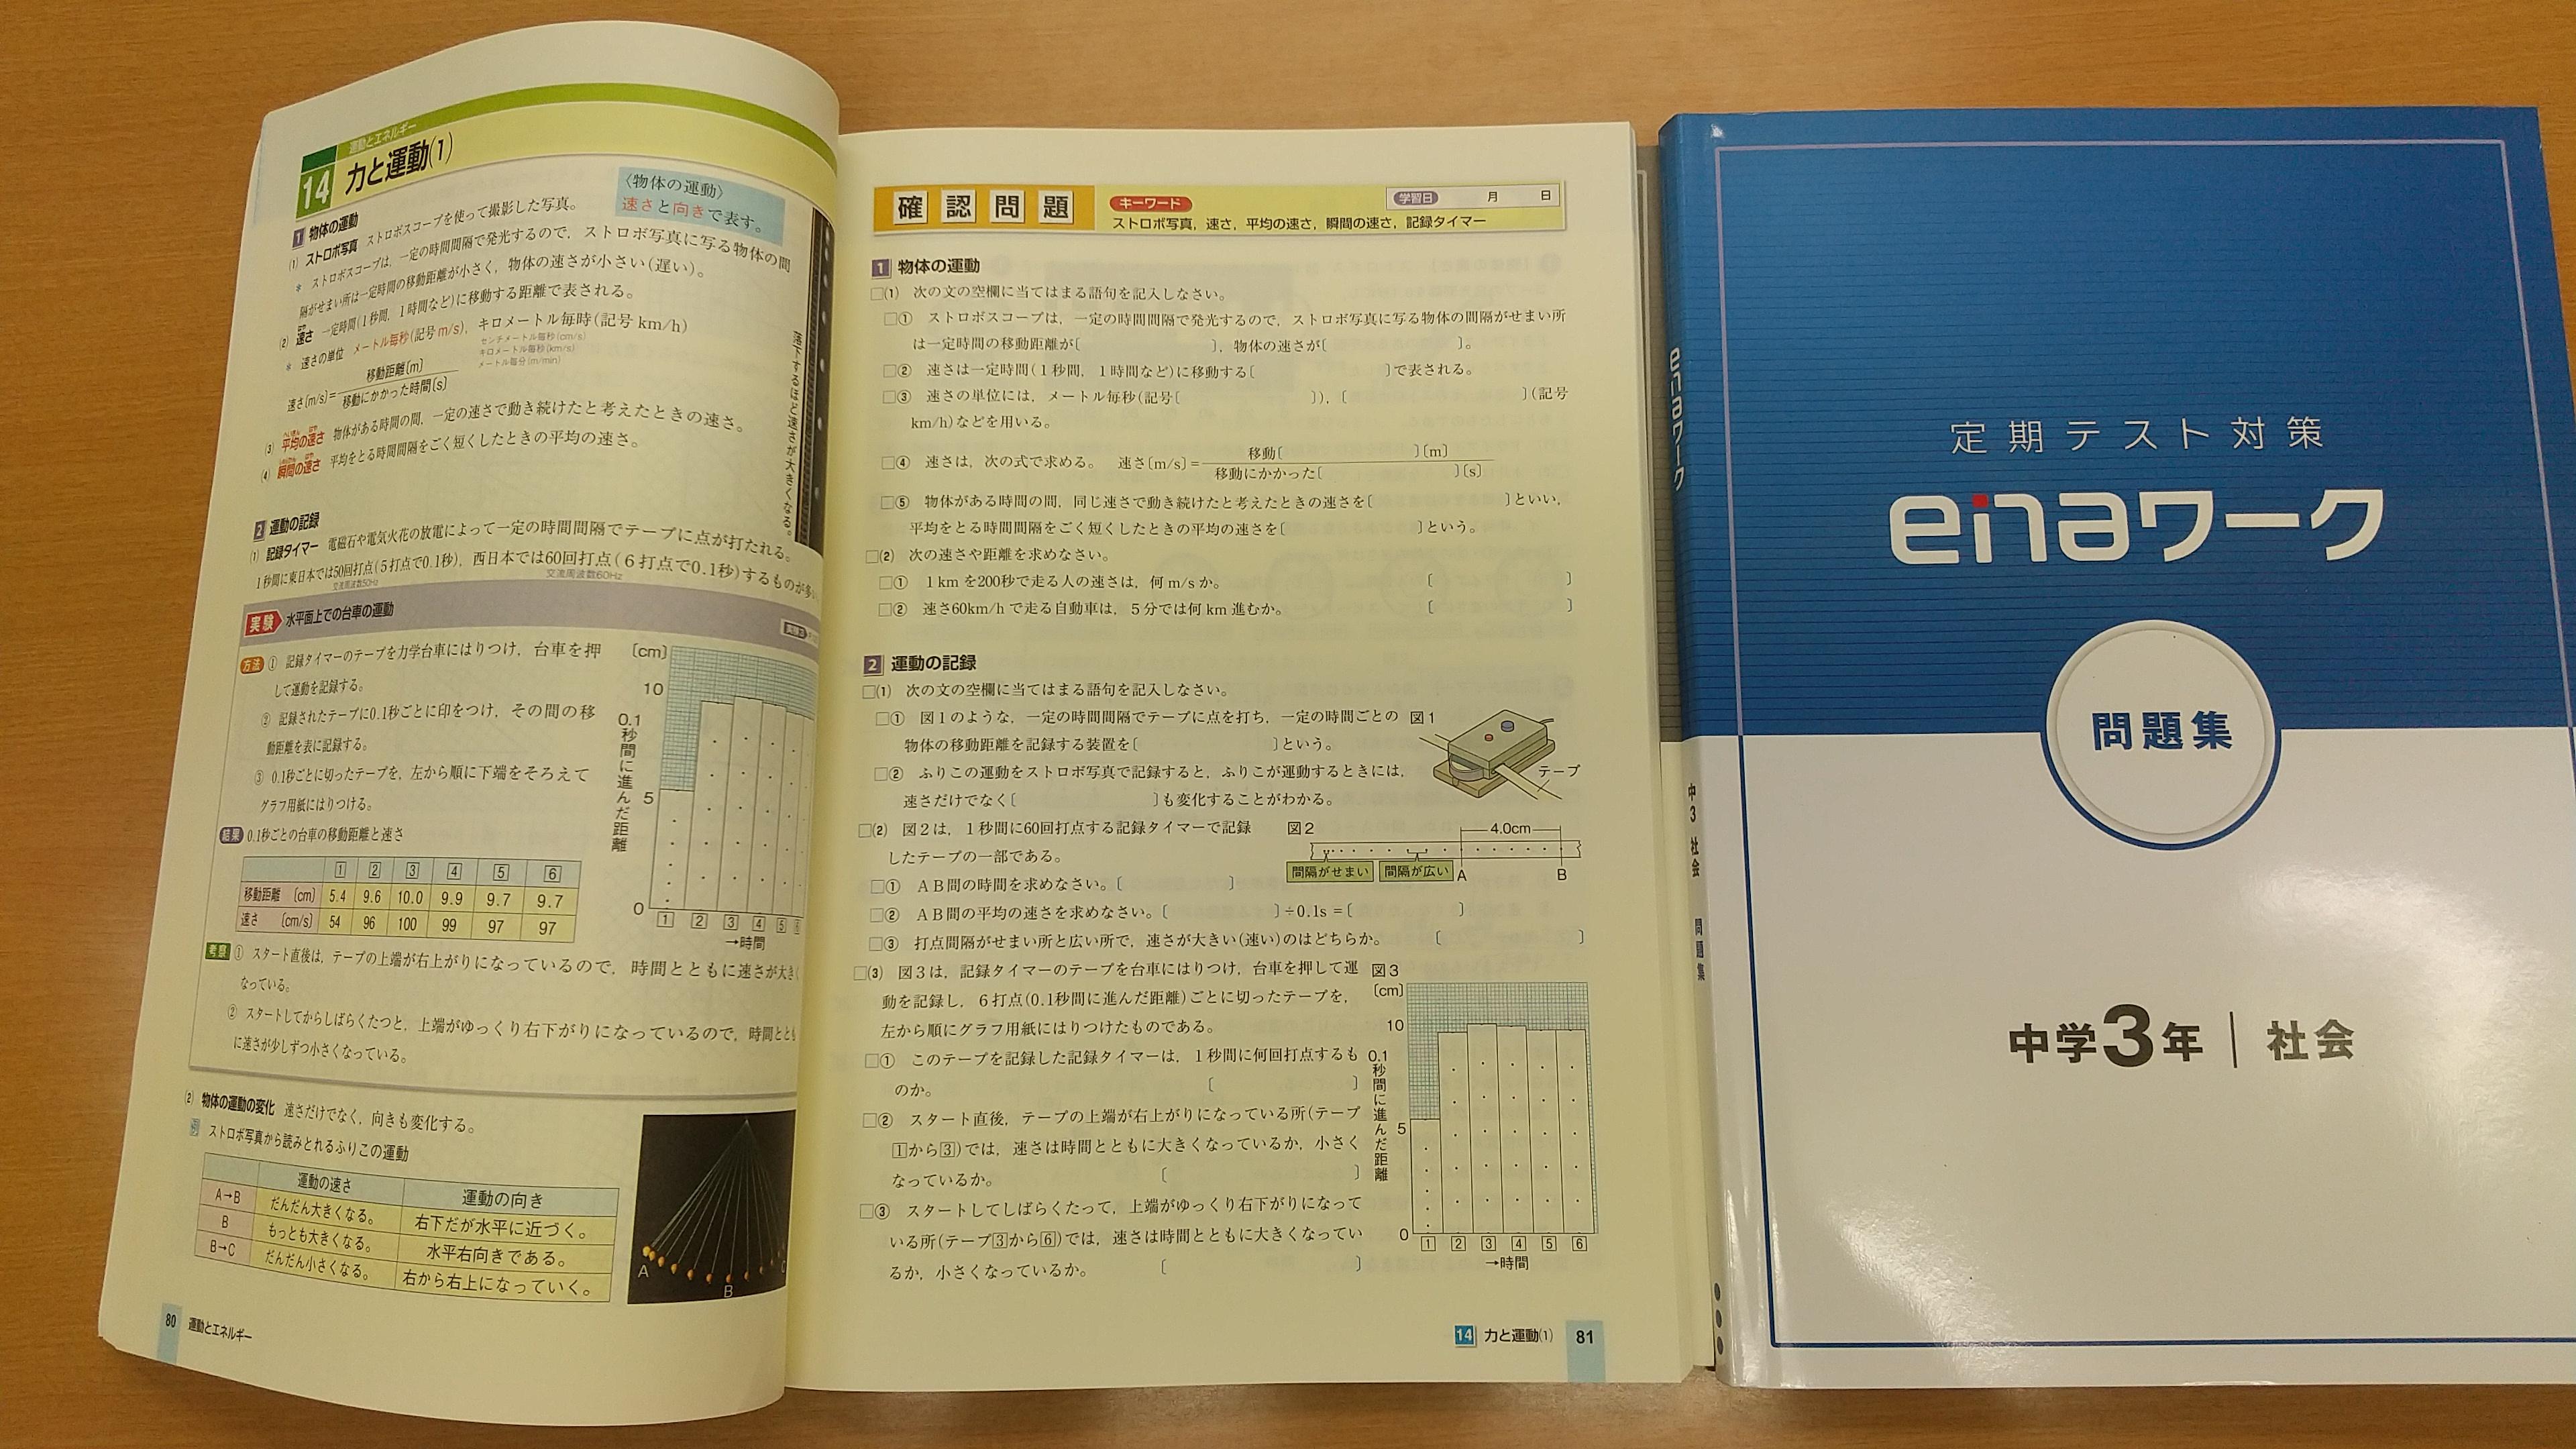 DSC_0851.JPG